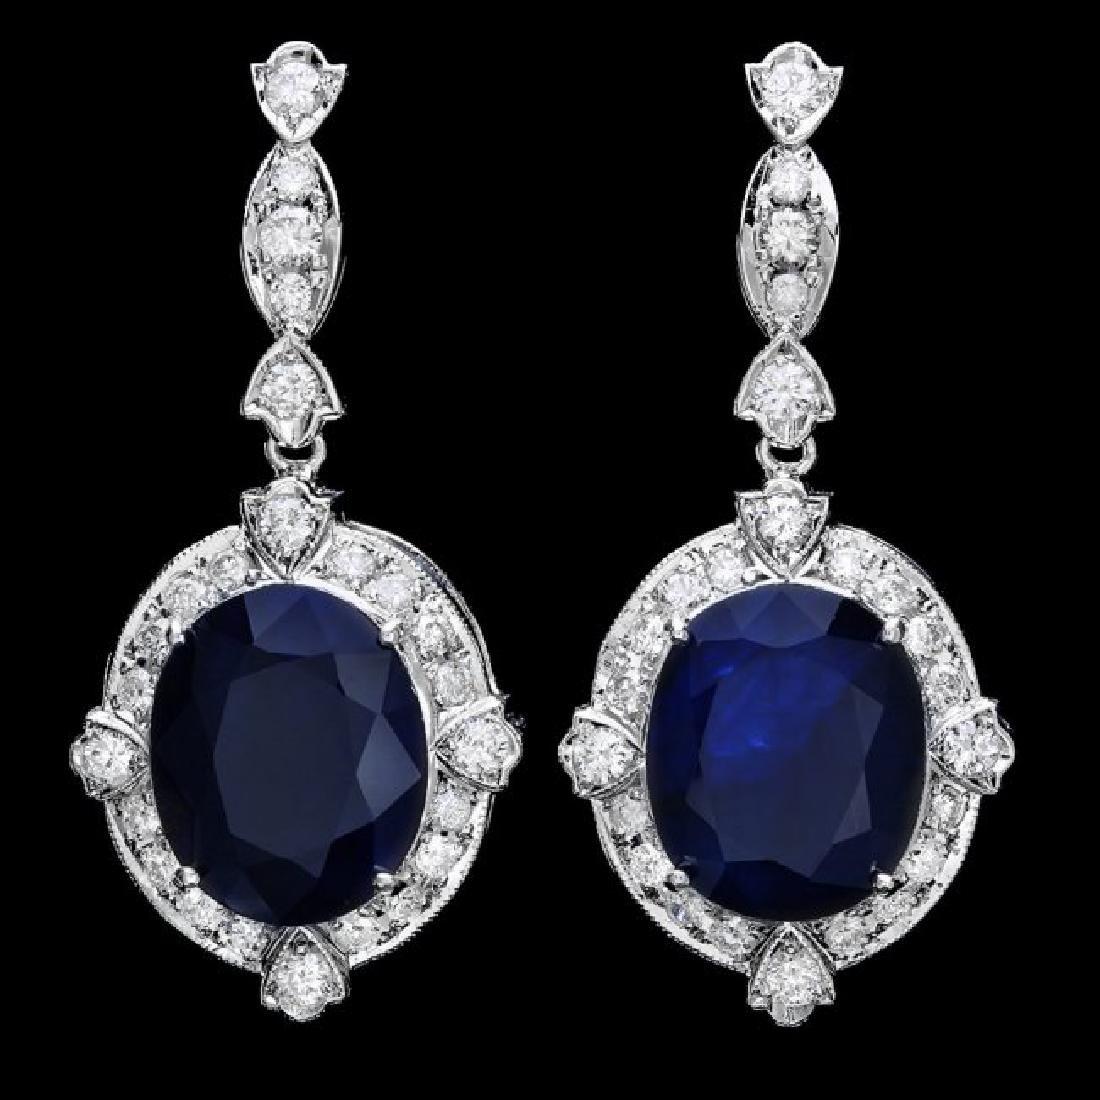 14k Gold 18ct Sapphire 1.80ct Diamond Earrings